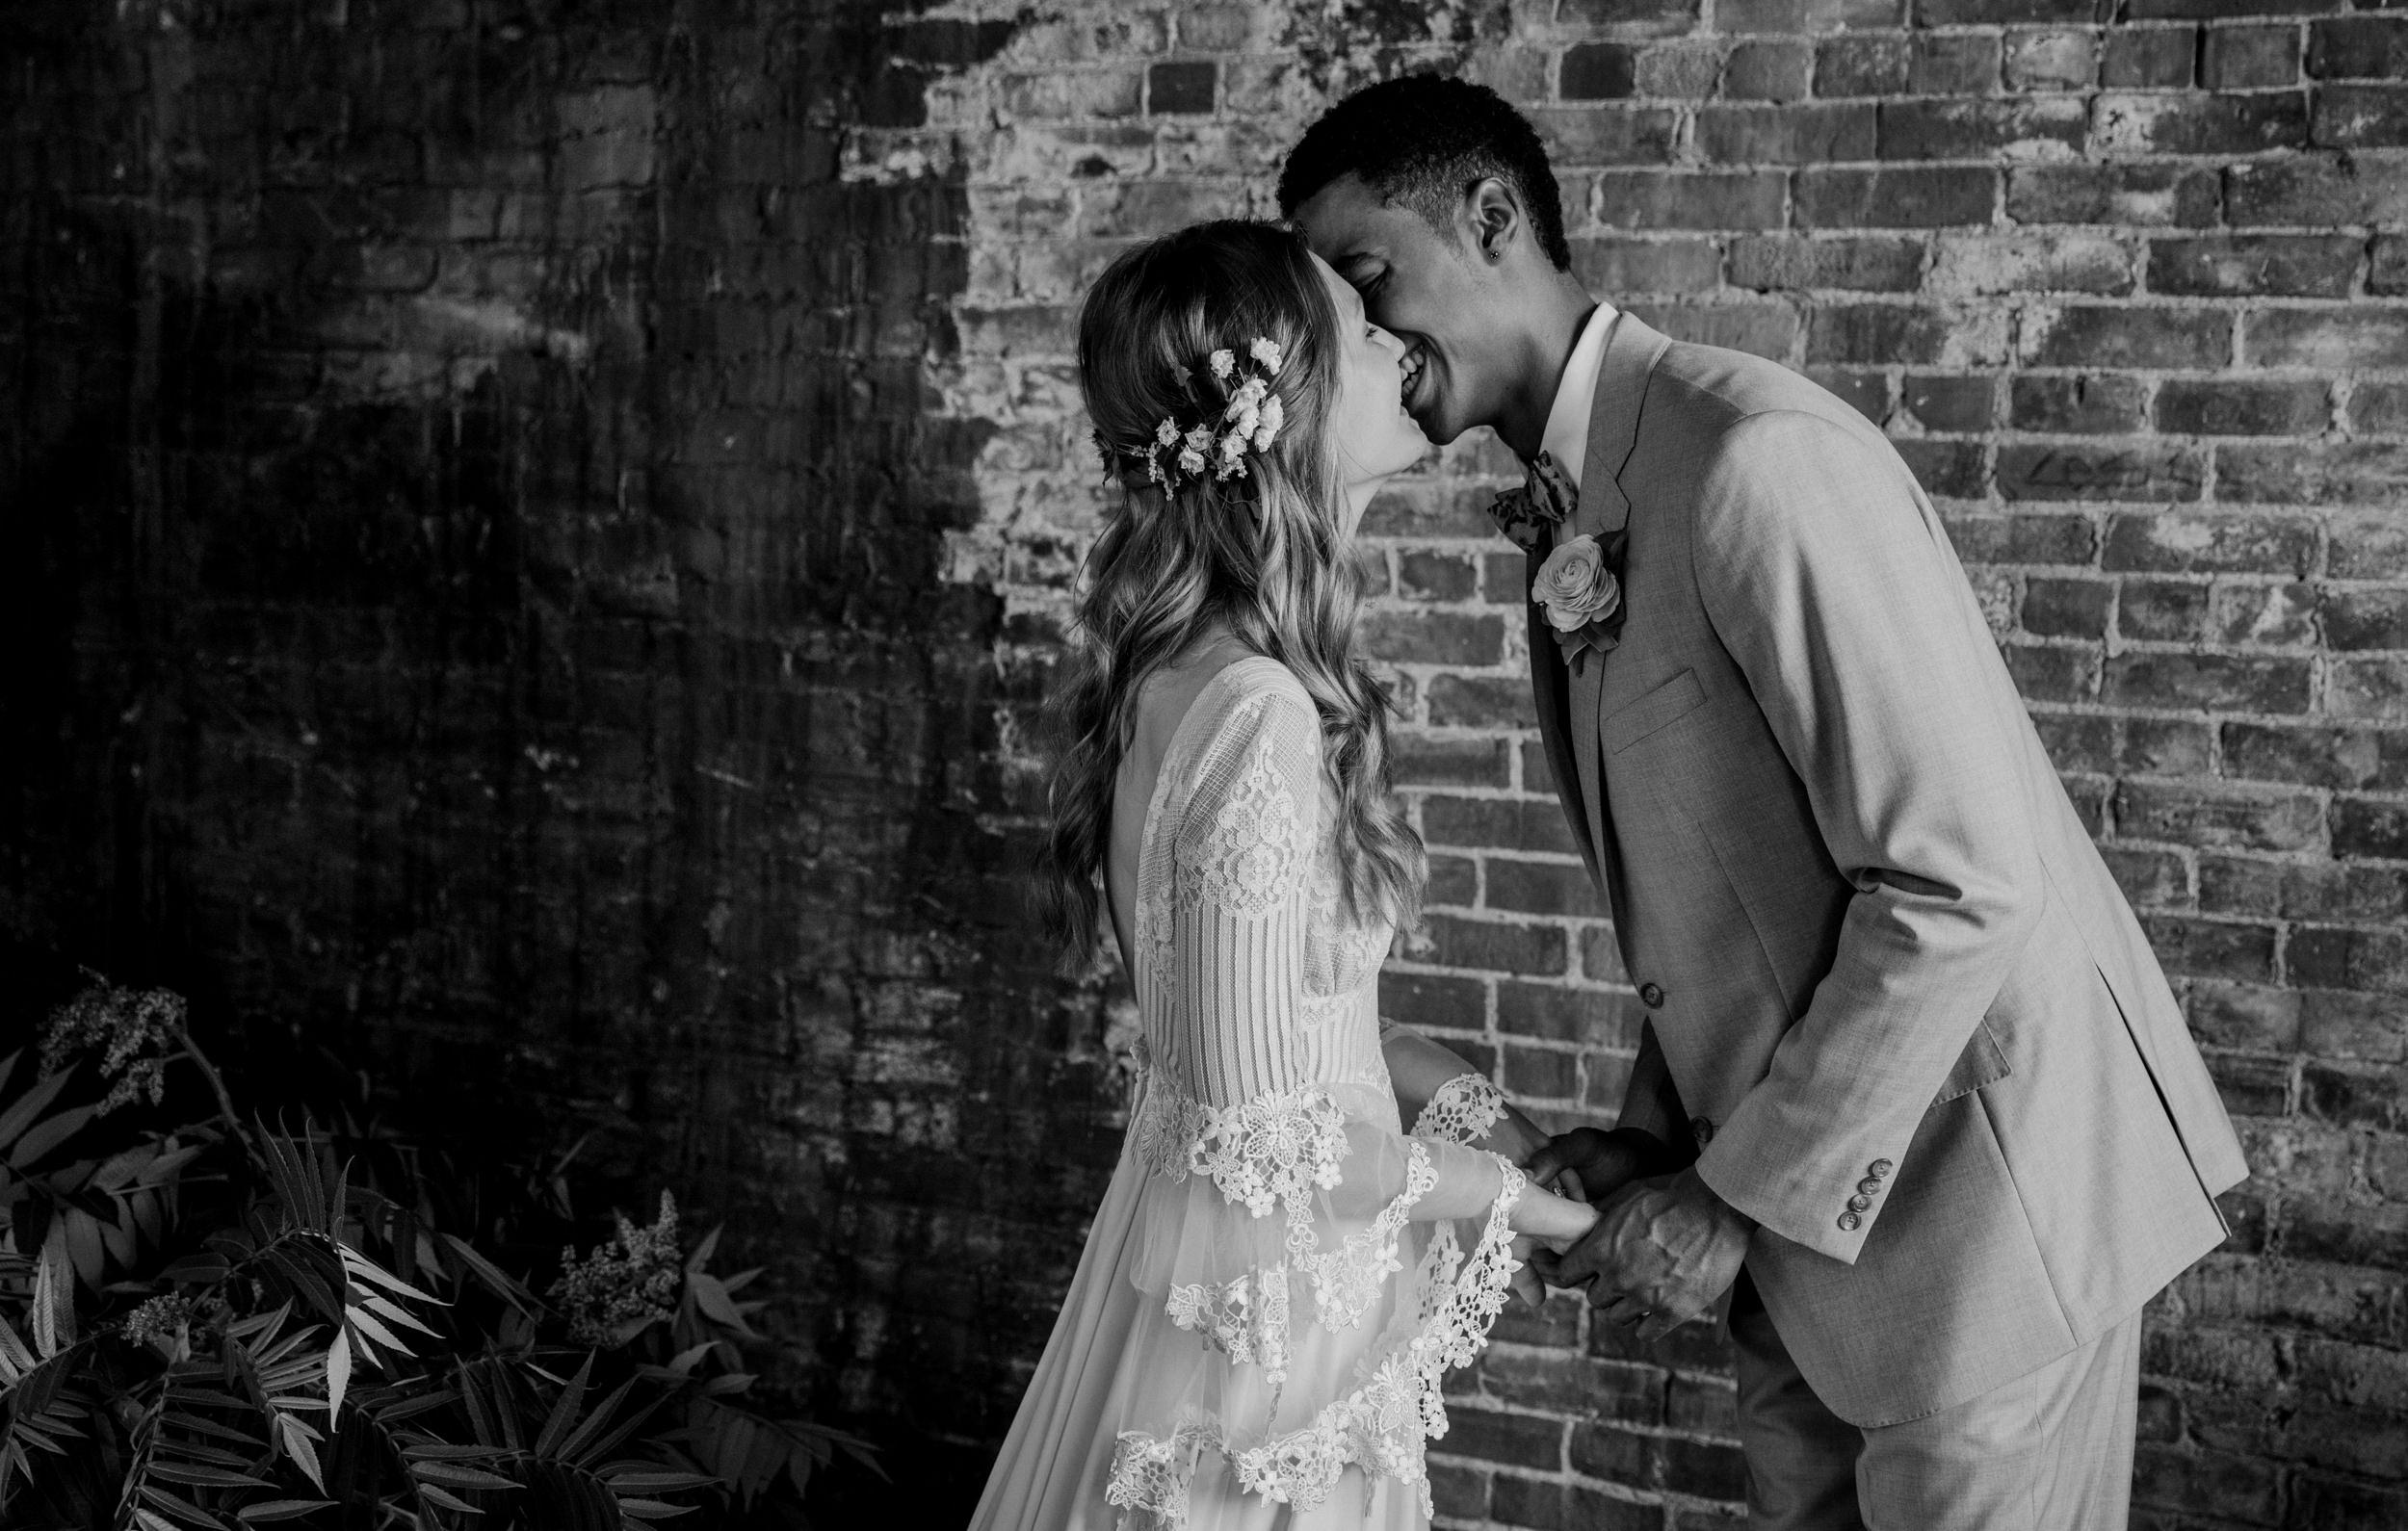 fidelio_boho_styled_wedding007bw.jpg